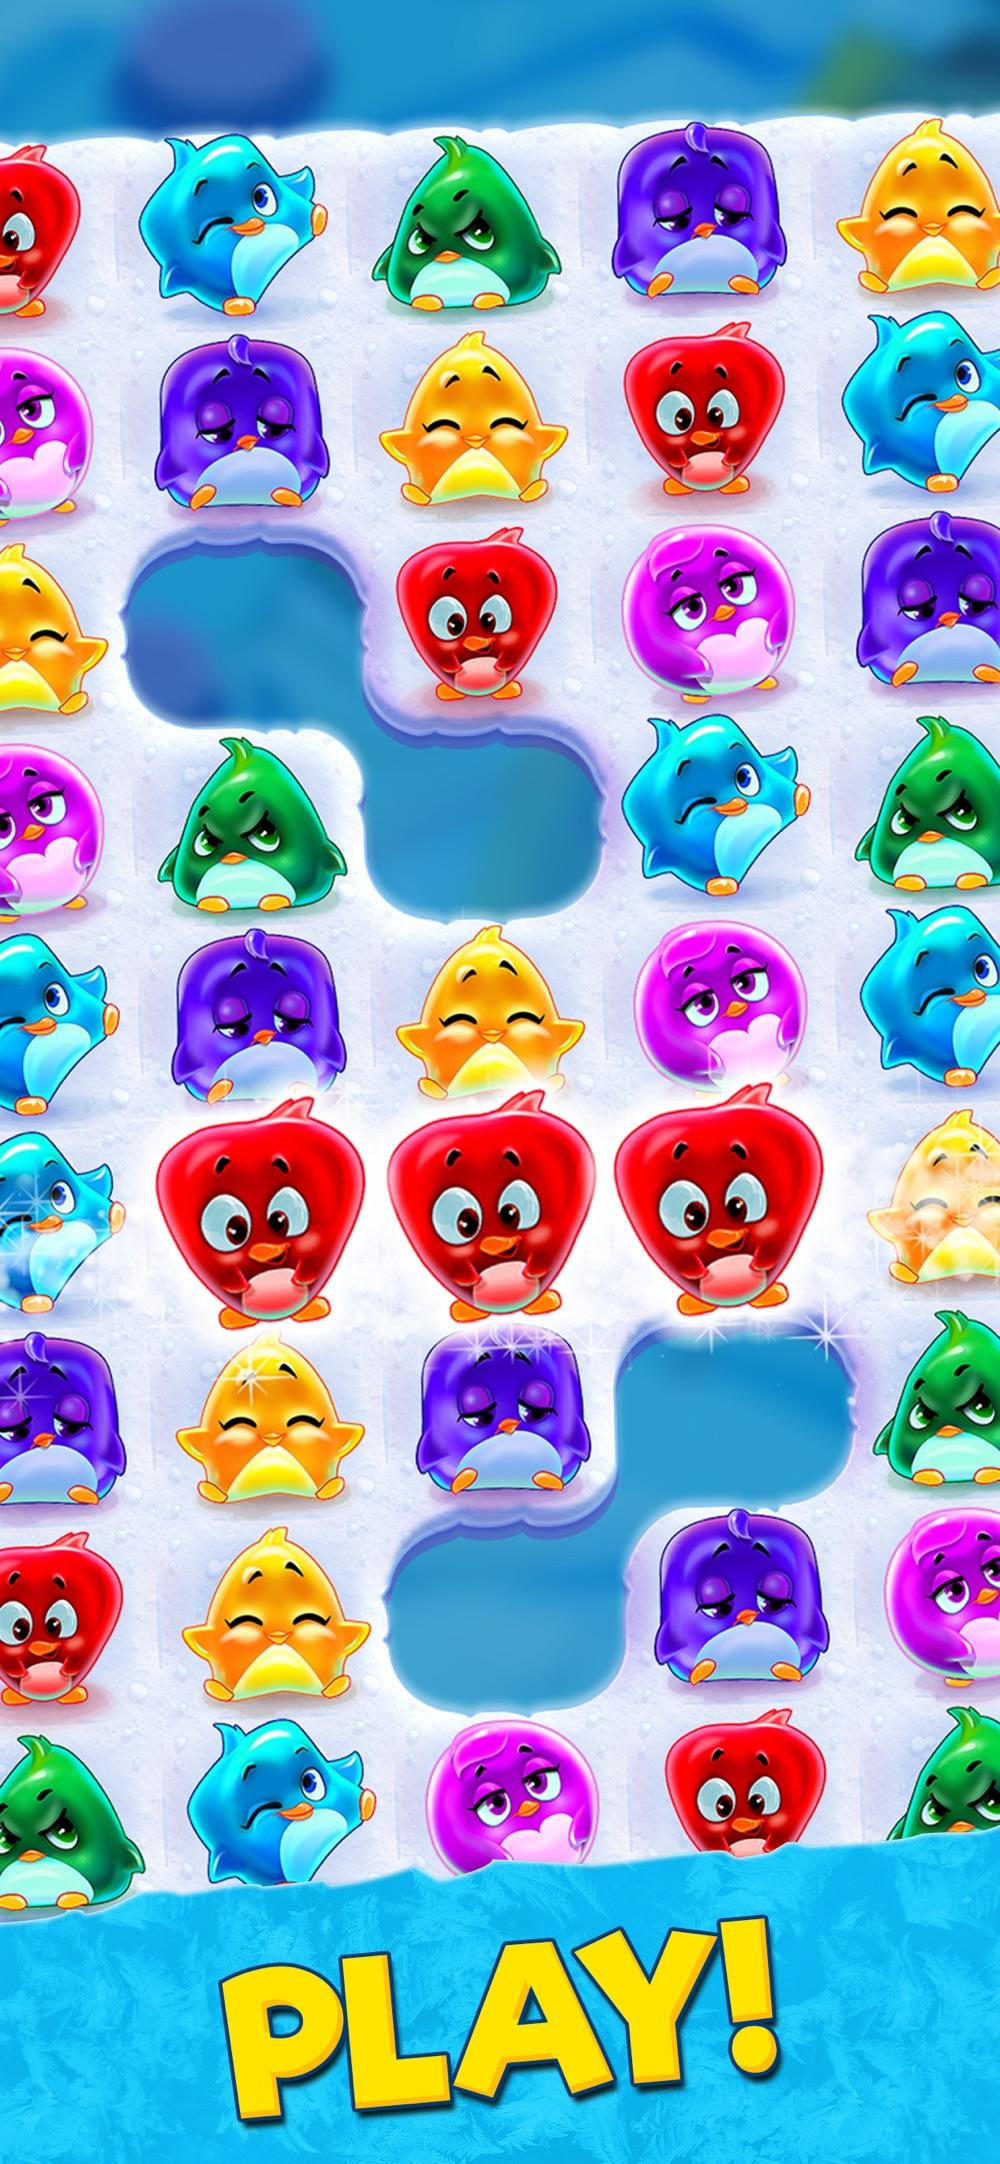 Penguin Swap: match 3 games Cheat Codes